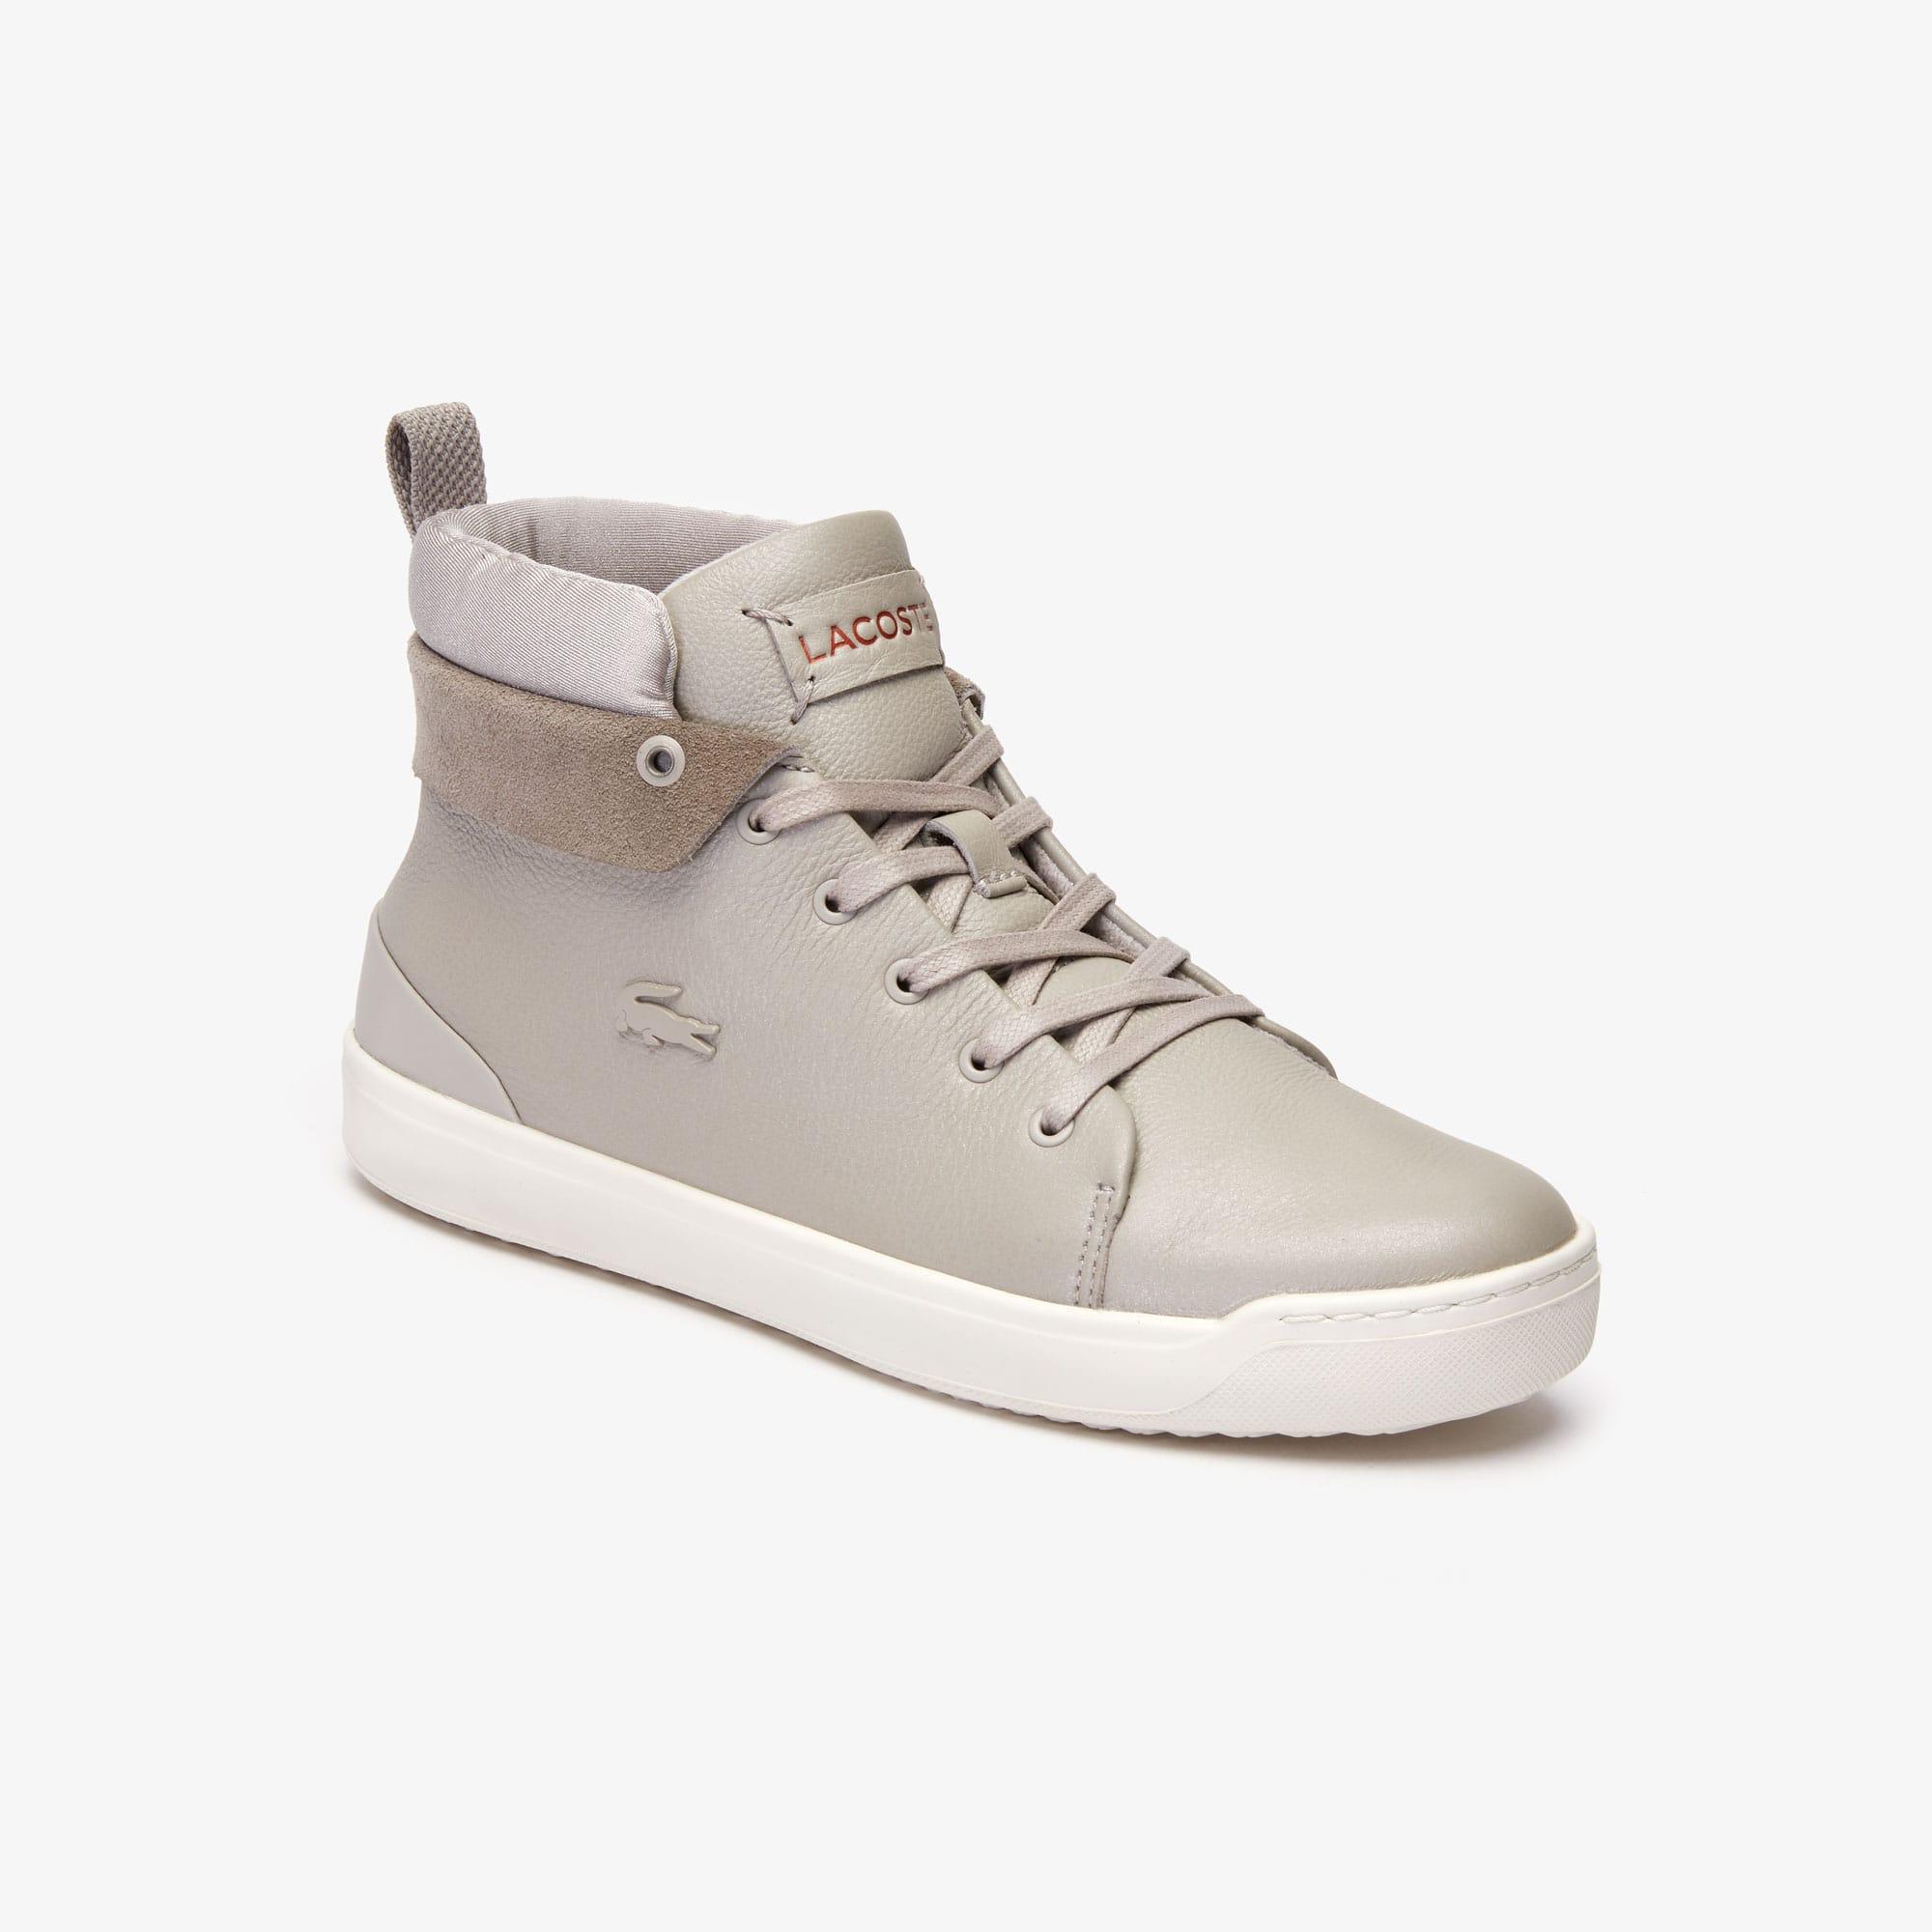 wholesale dealer ce9e7 ffb22 Polos, Kleidung und Lederwaren Online | LACOSTE